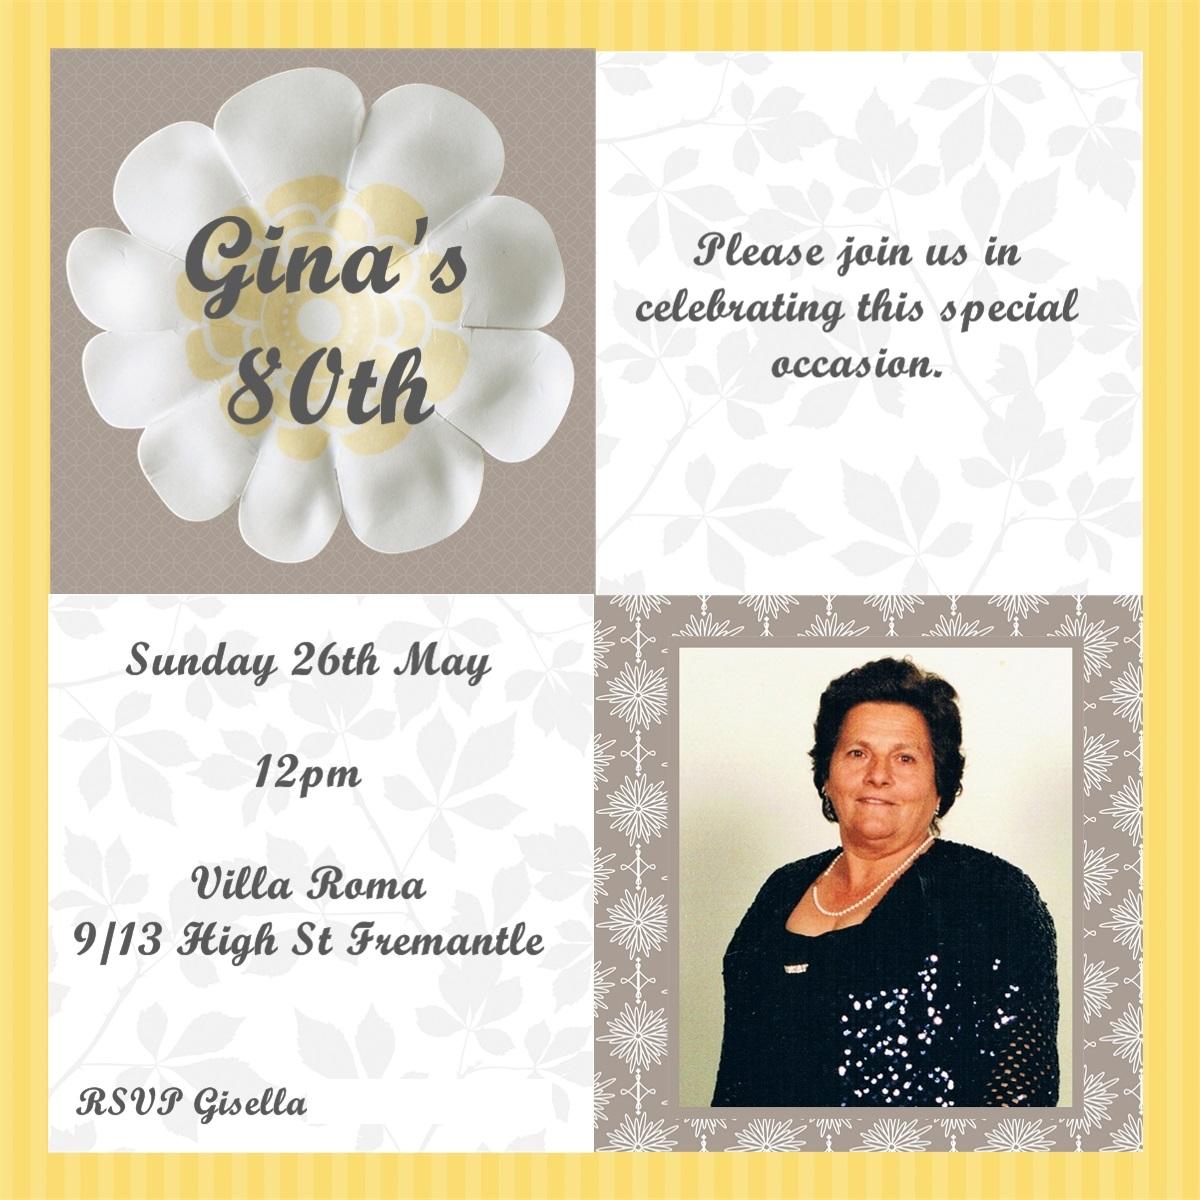 Nonna 80th Birthday Invitations | thecreativemummy